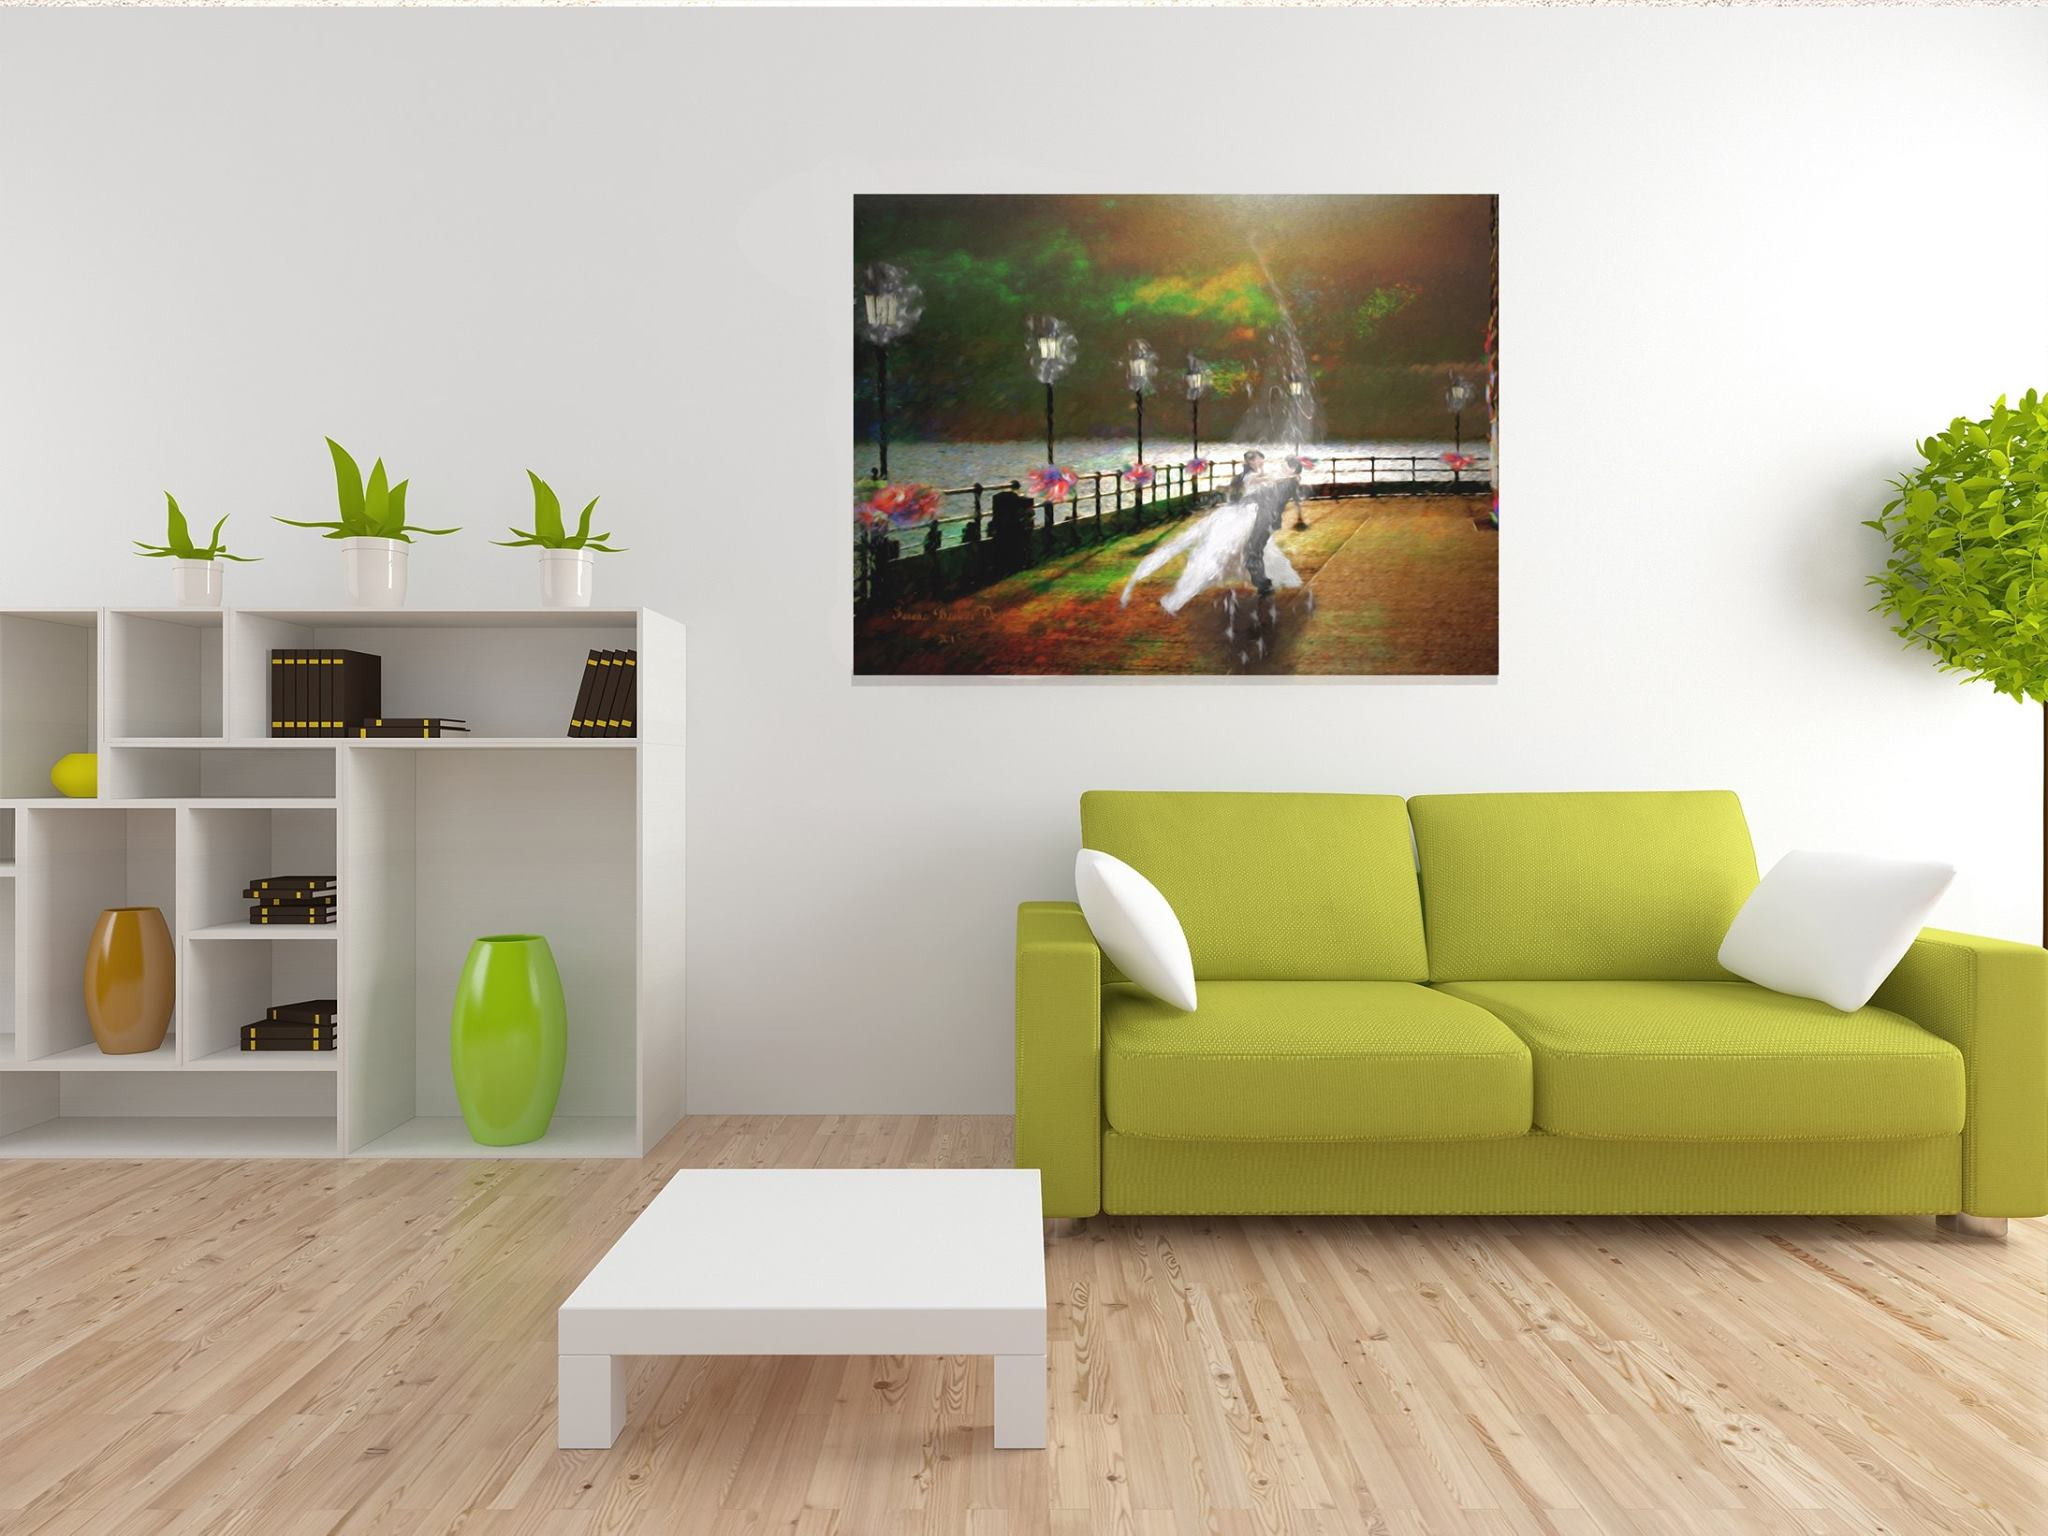 ArtBoja Green Living Room showcasing Custom Art Decor Prints